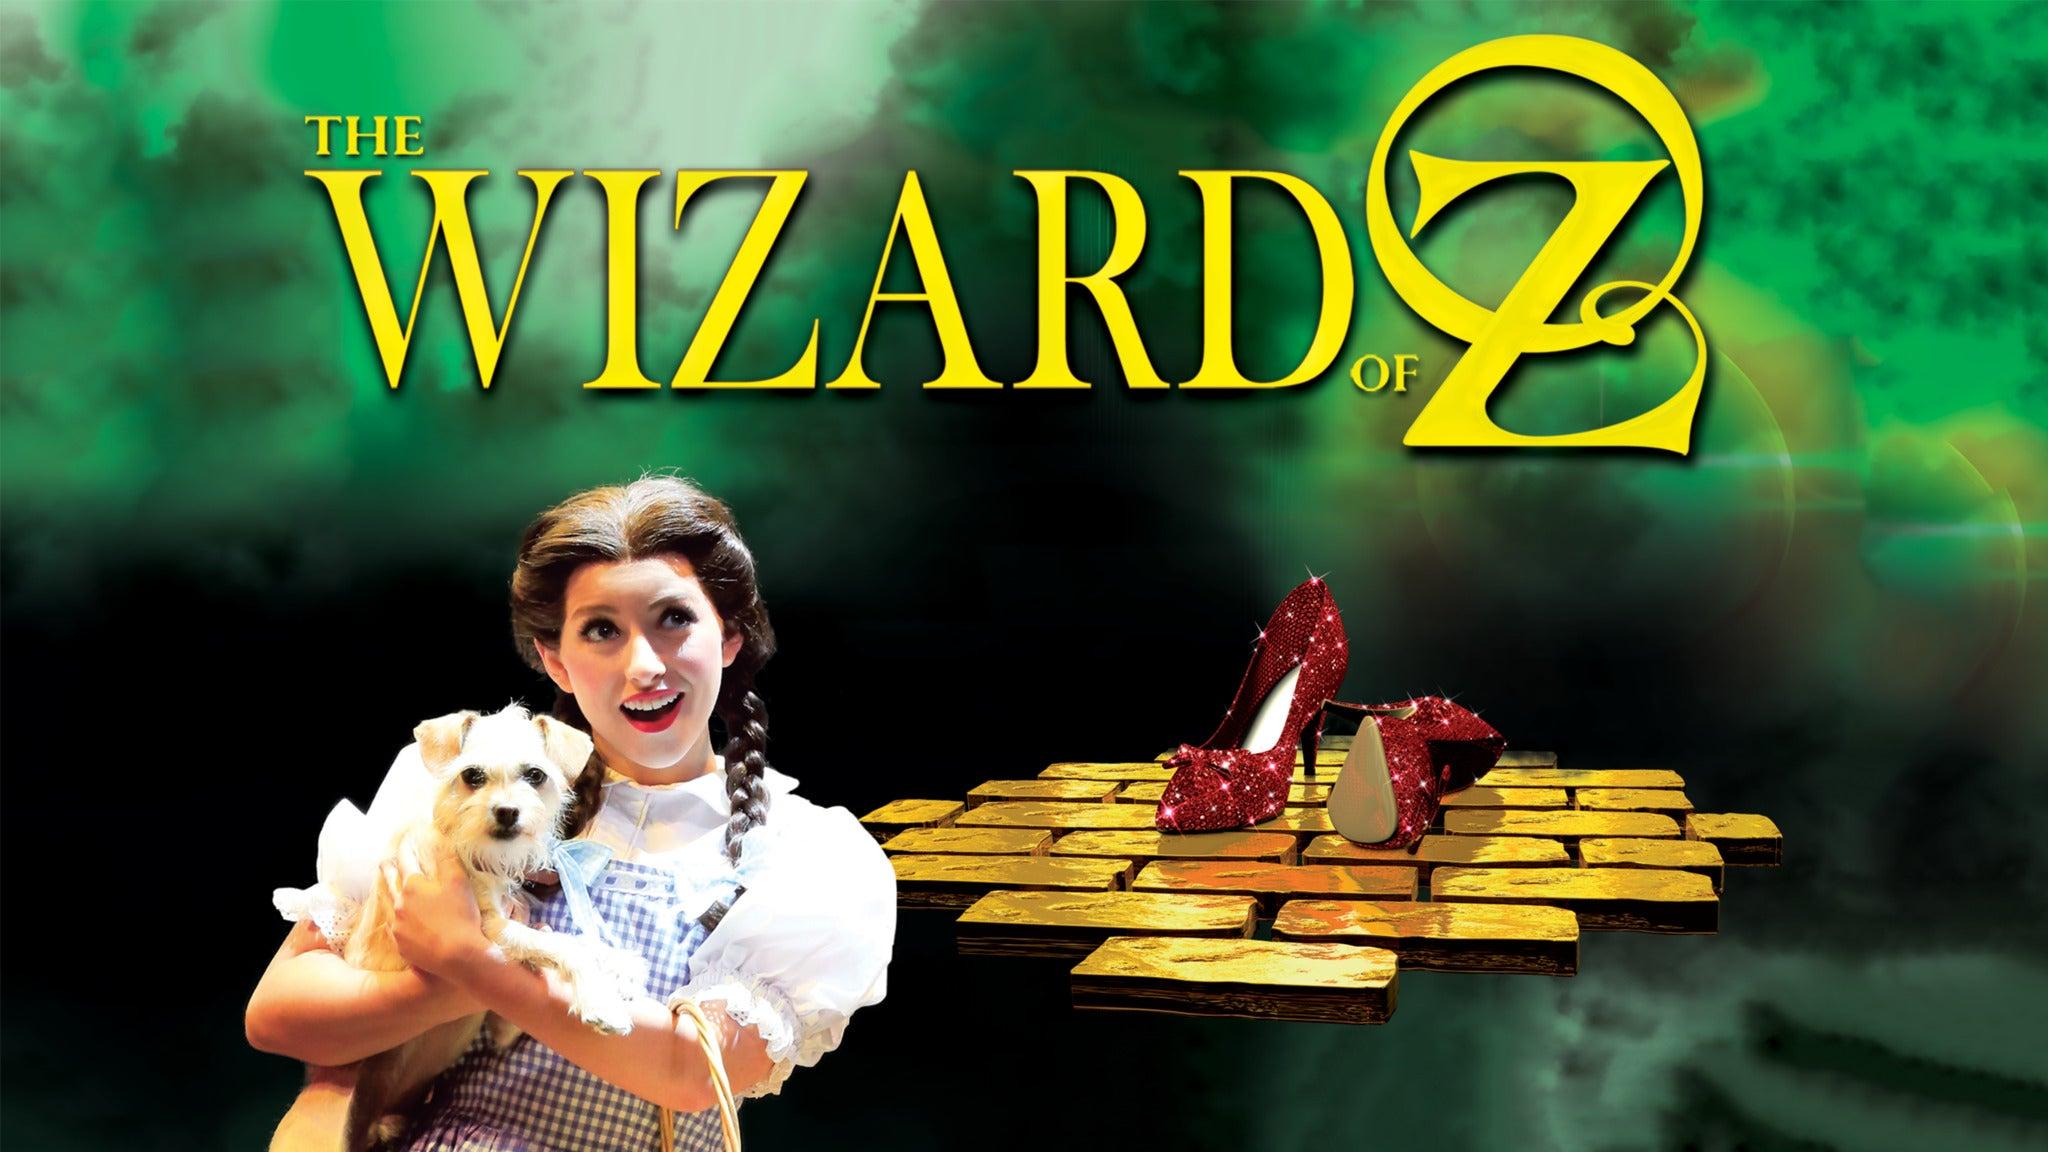 Wizard of Oz – Miami 2018 at James L Knight Center